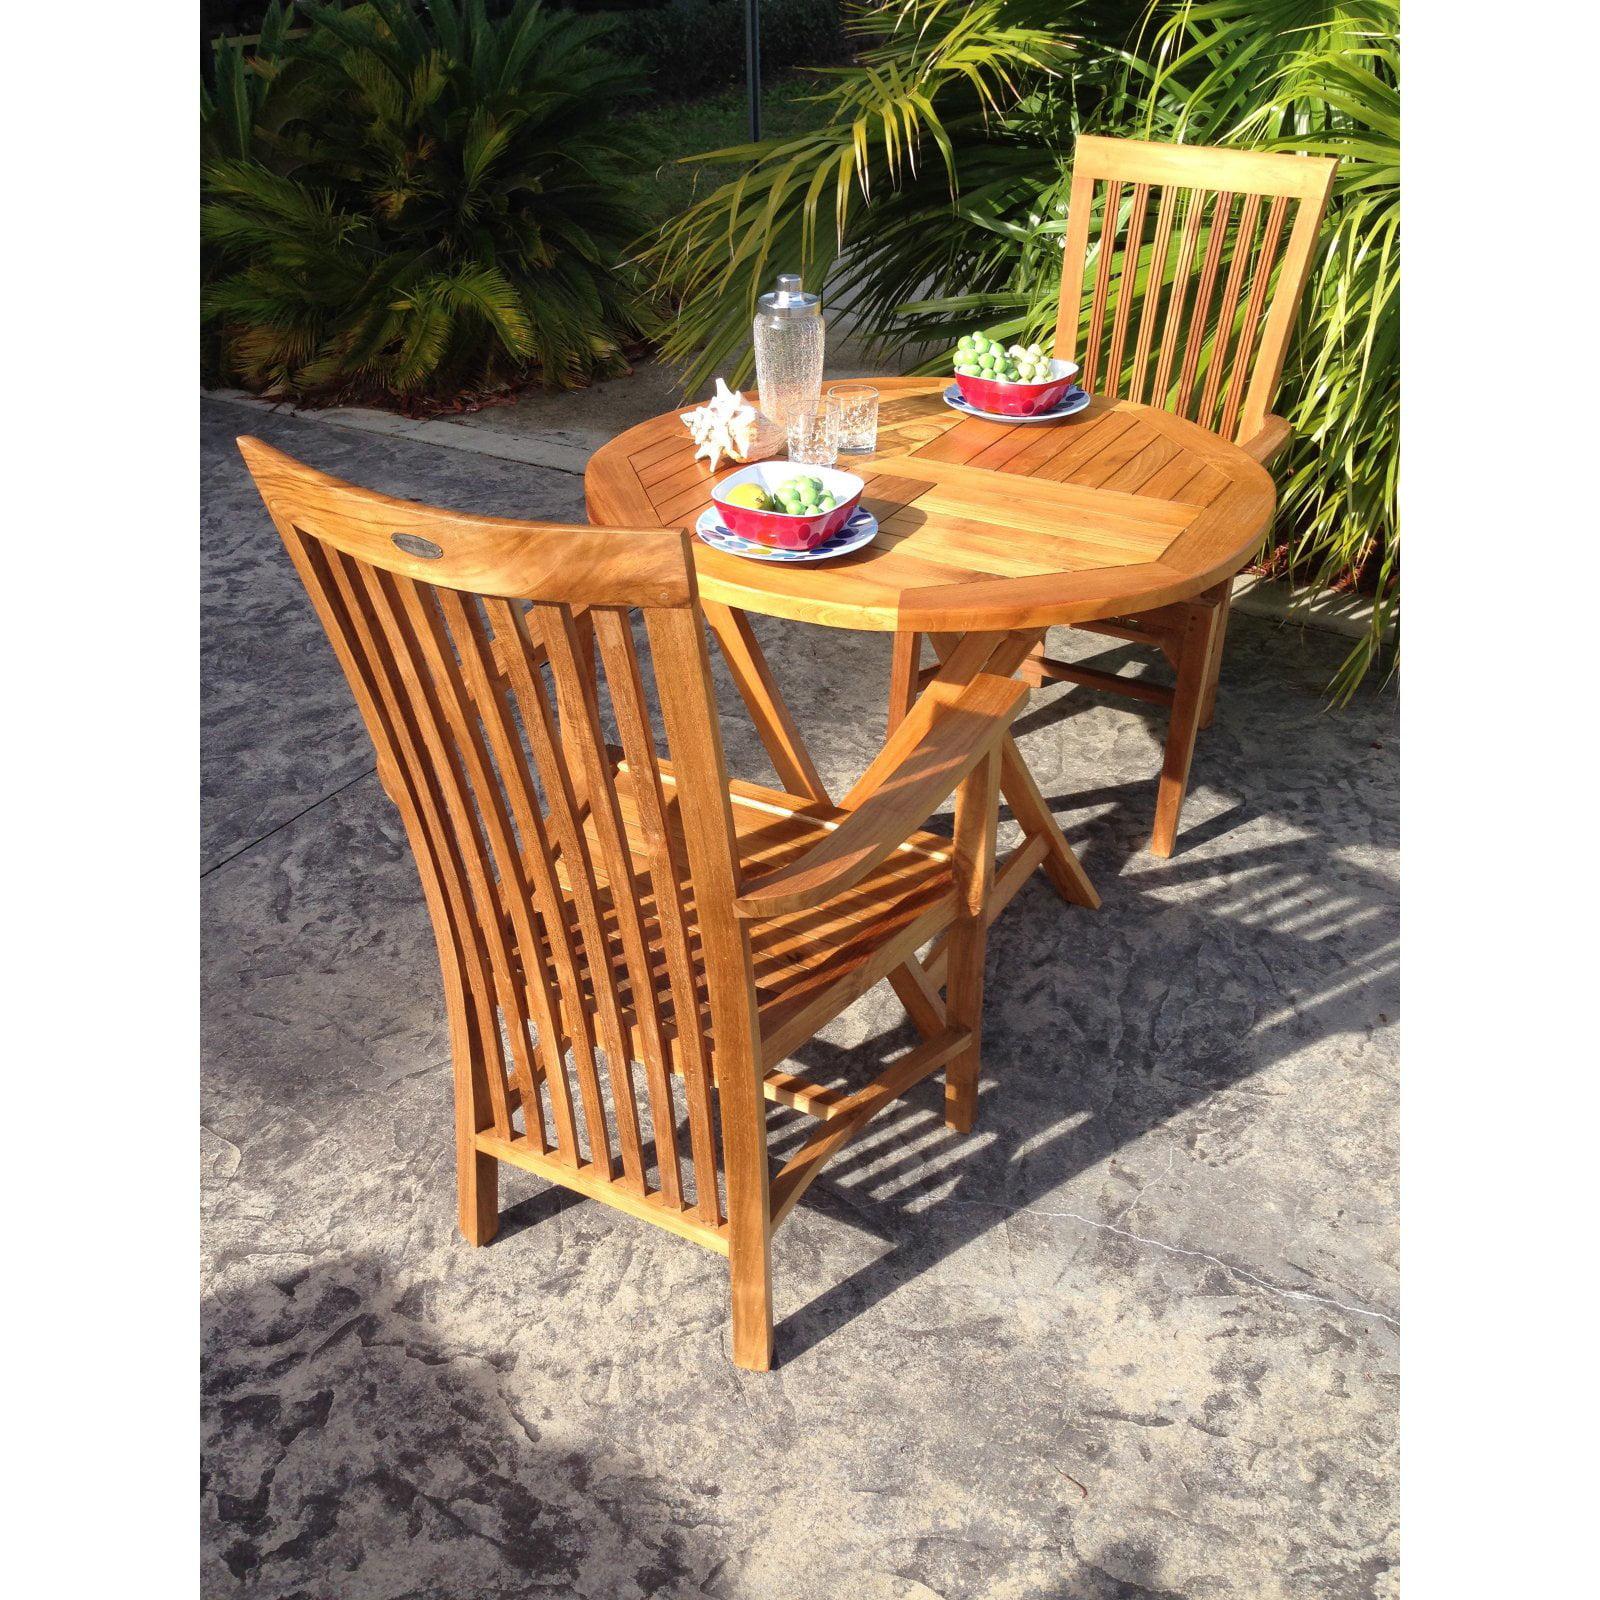 Chic Teak Balero Teak Patio Dining Armchair by